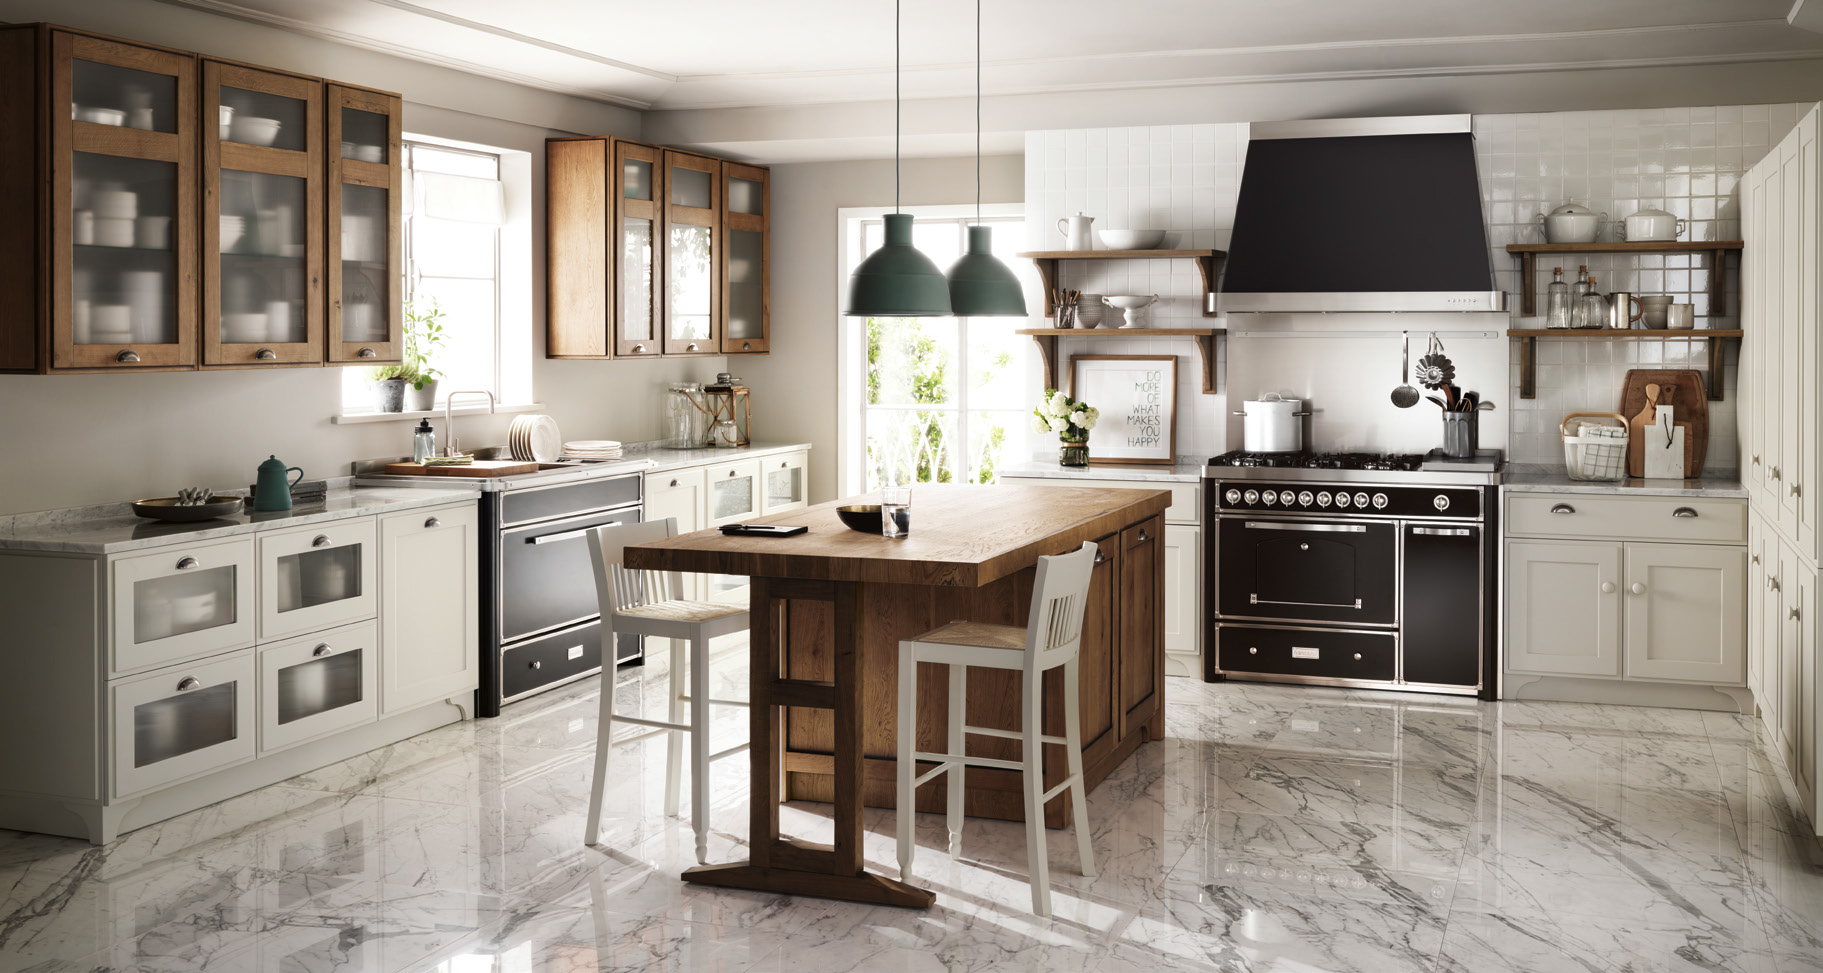 Awesome Scavolini Kitchen Scenery